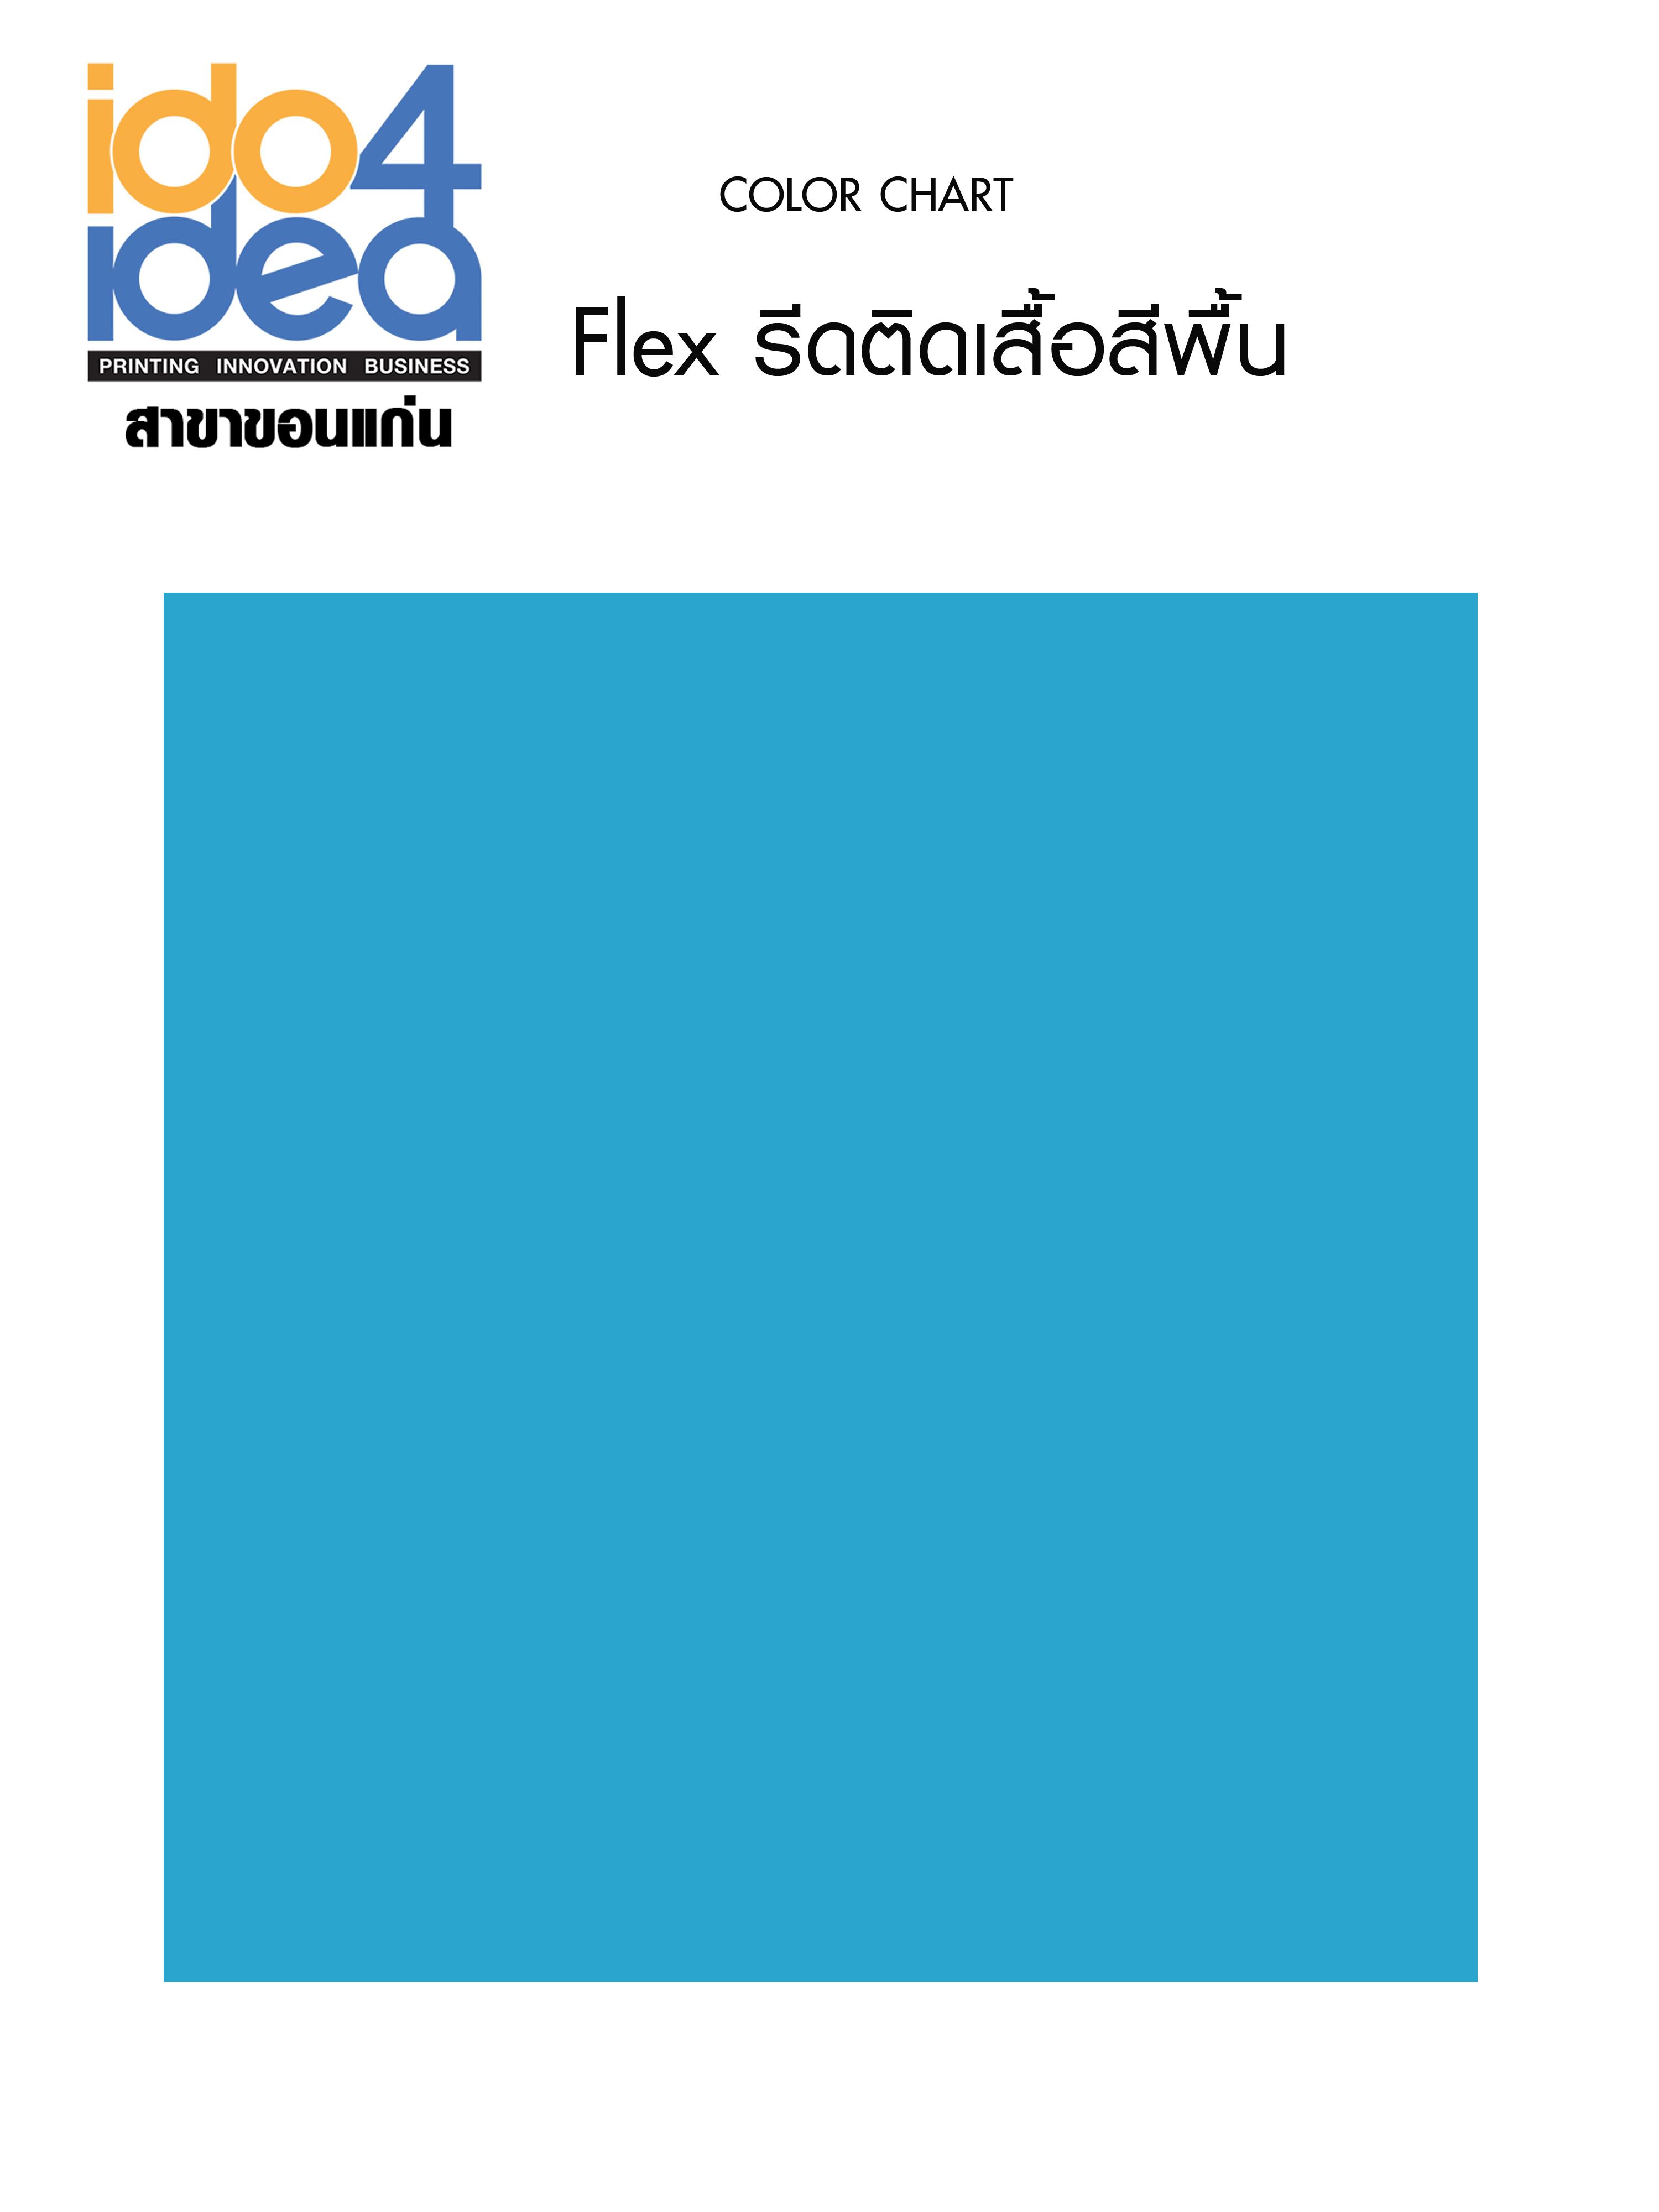 Flex Pu 100% สีพื้นฟ้า